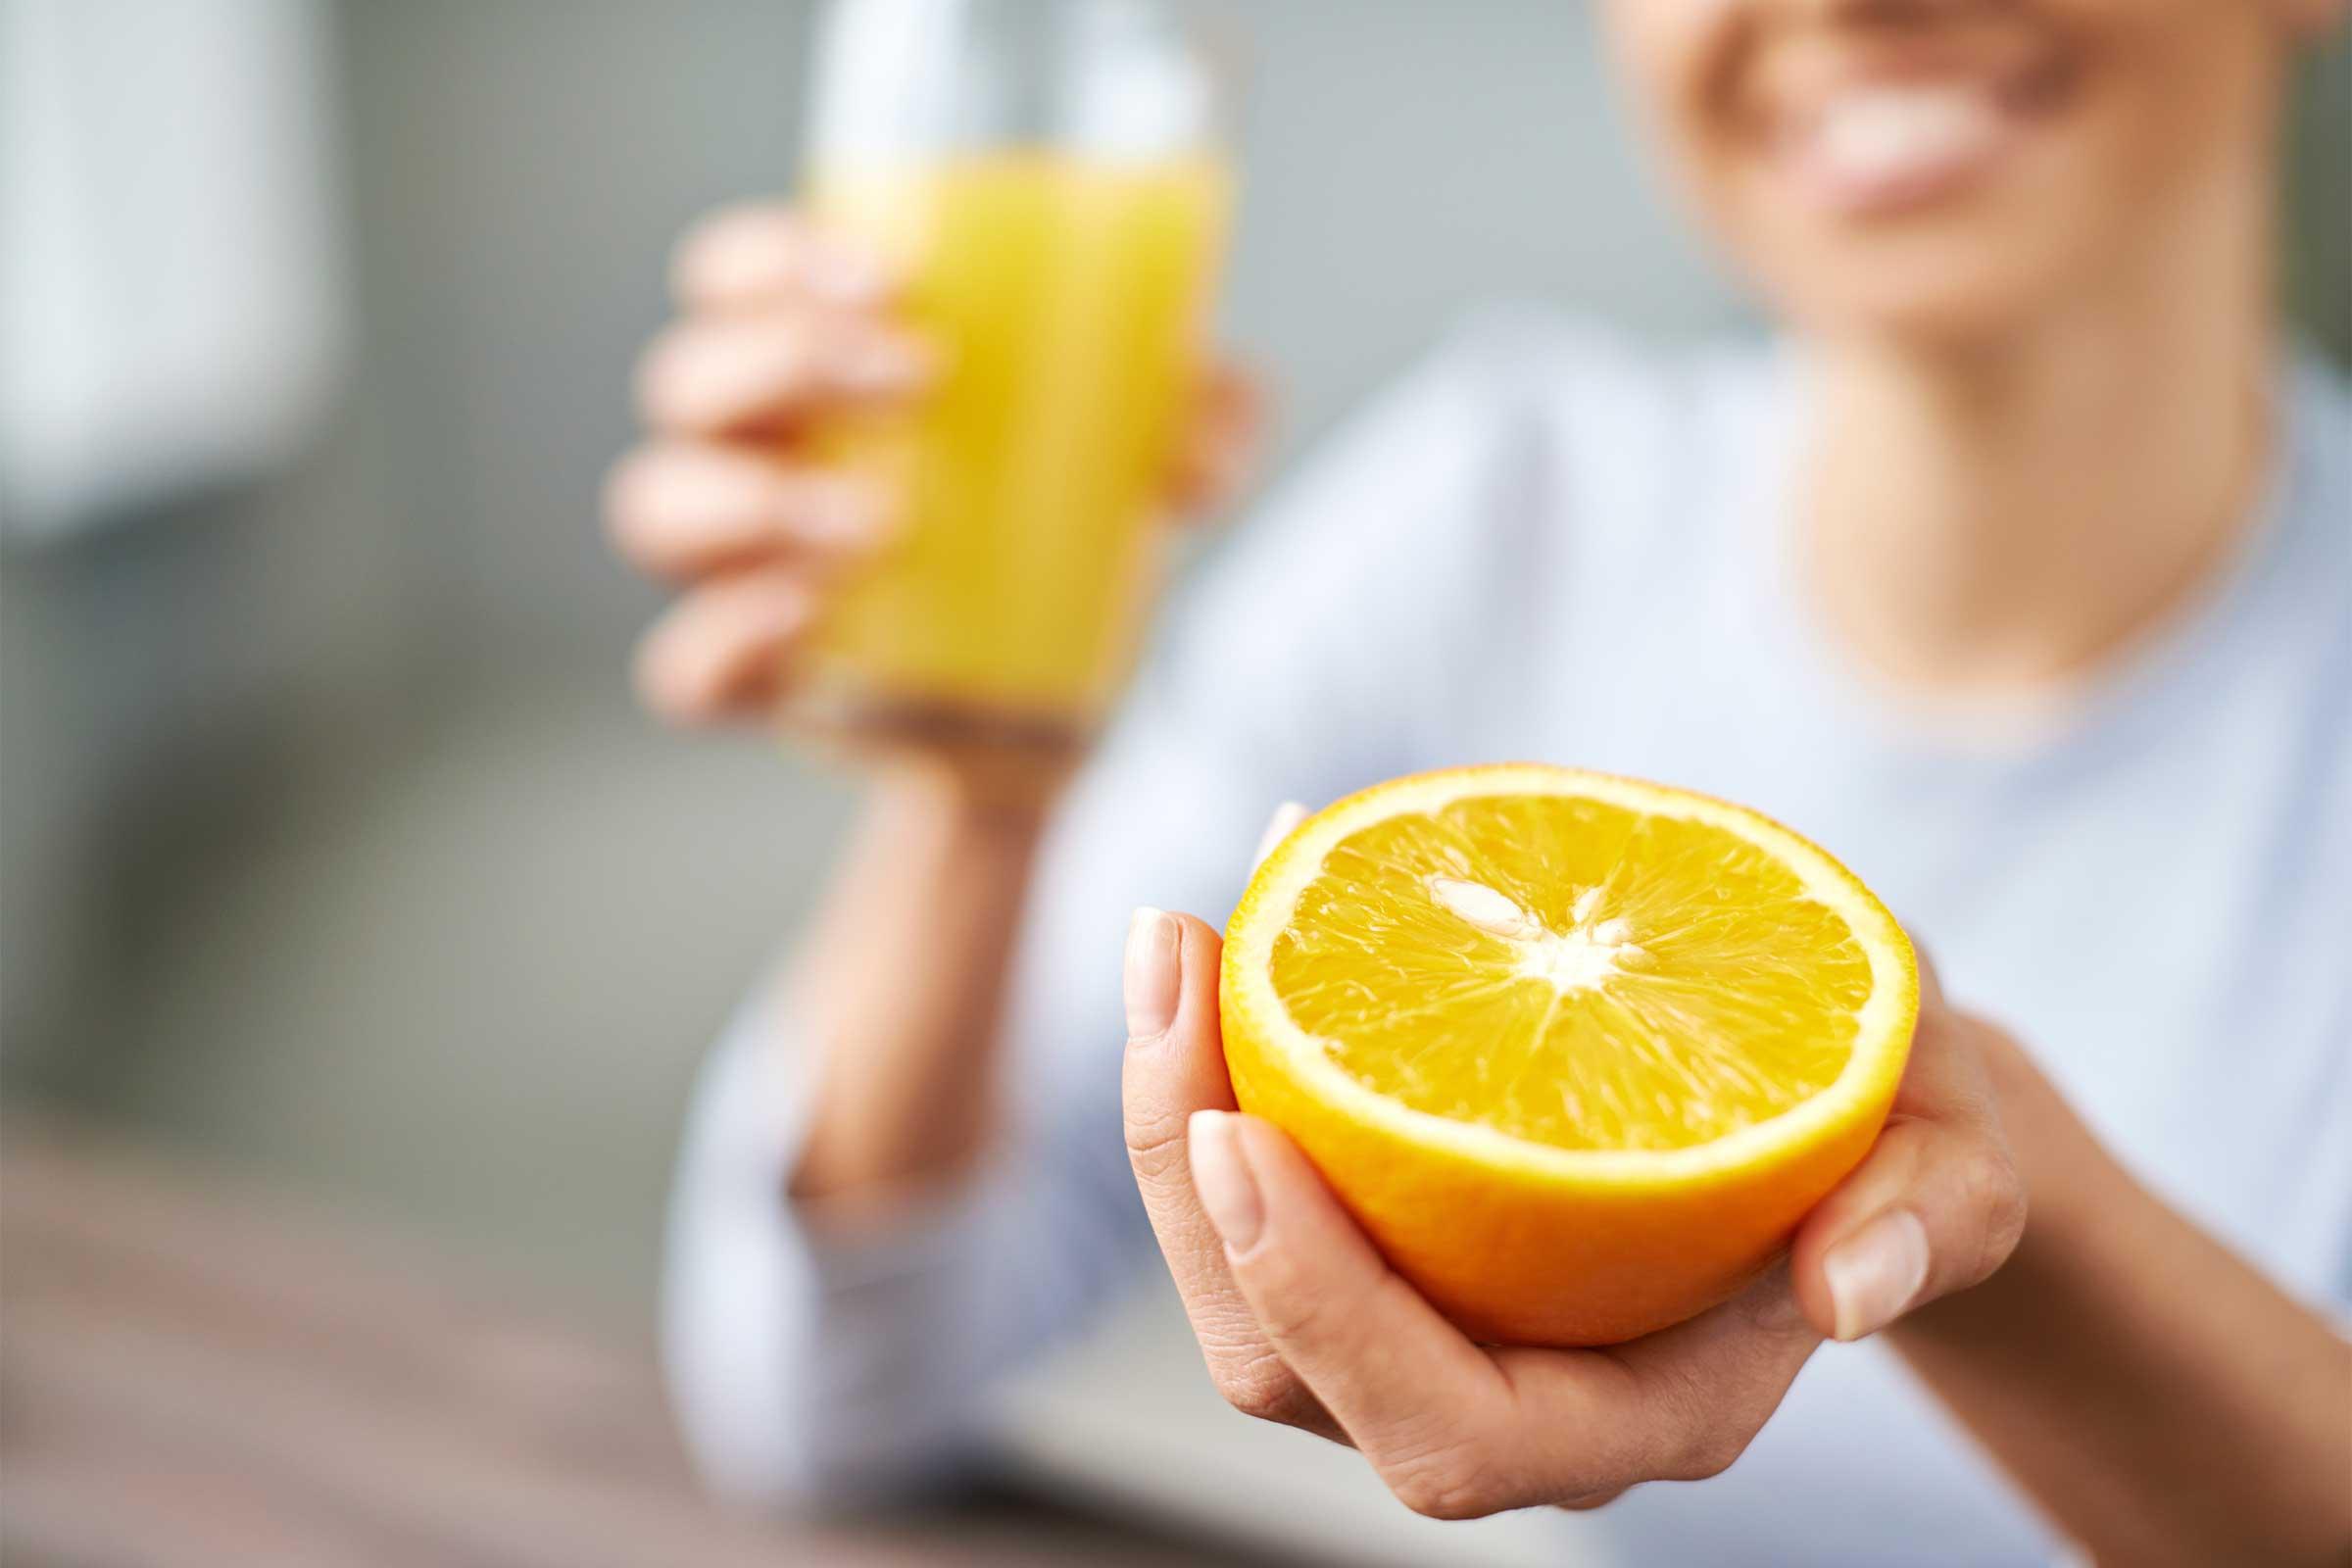 Makan Jeruk Setiap Hari, Salah Satu Kunci Panjang Umur